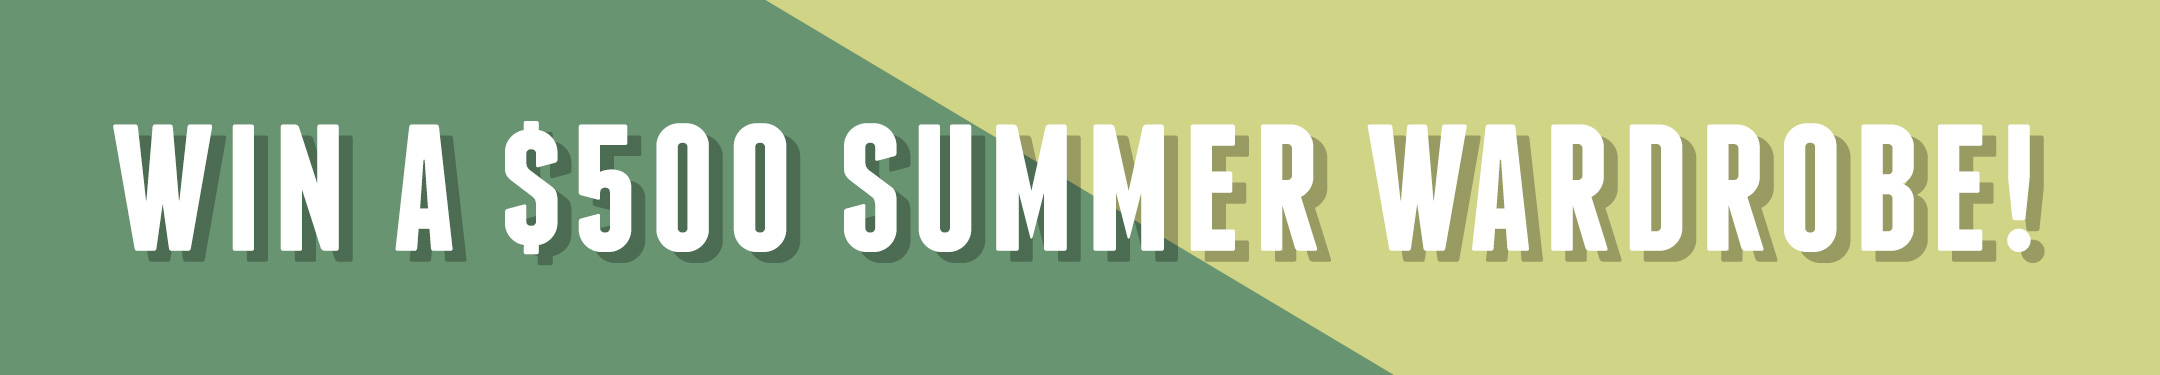 Enter to Win a $500 Summer Wardrobe